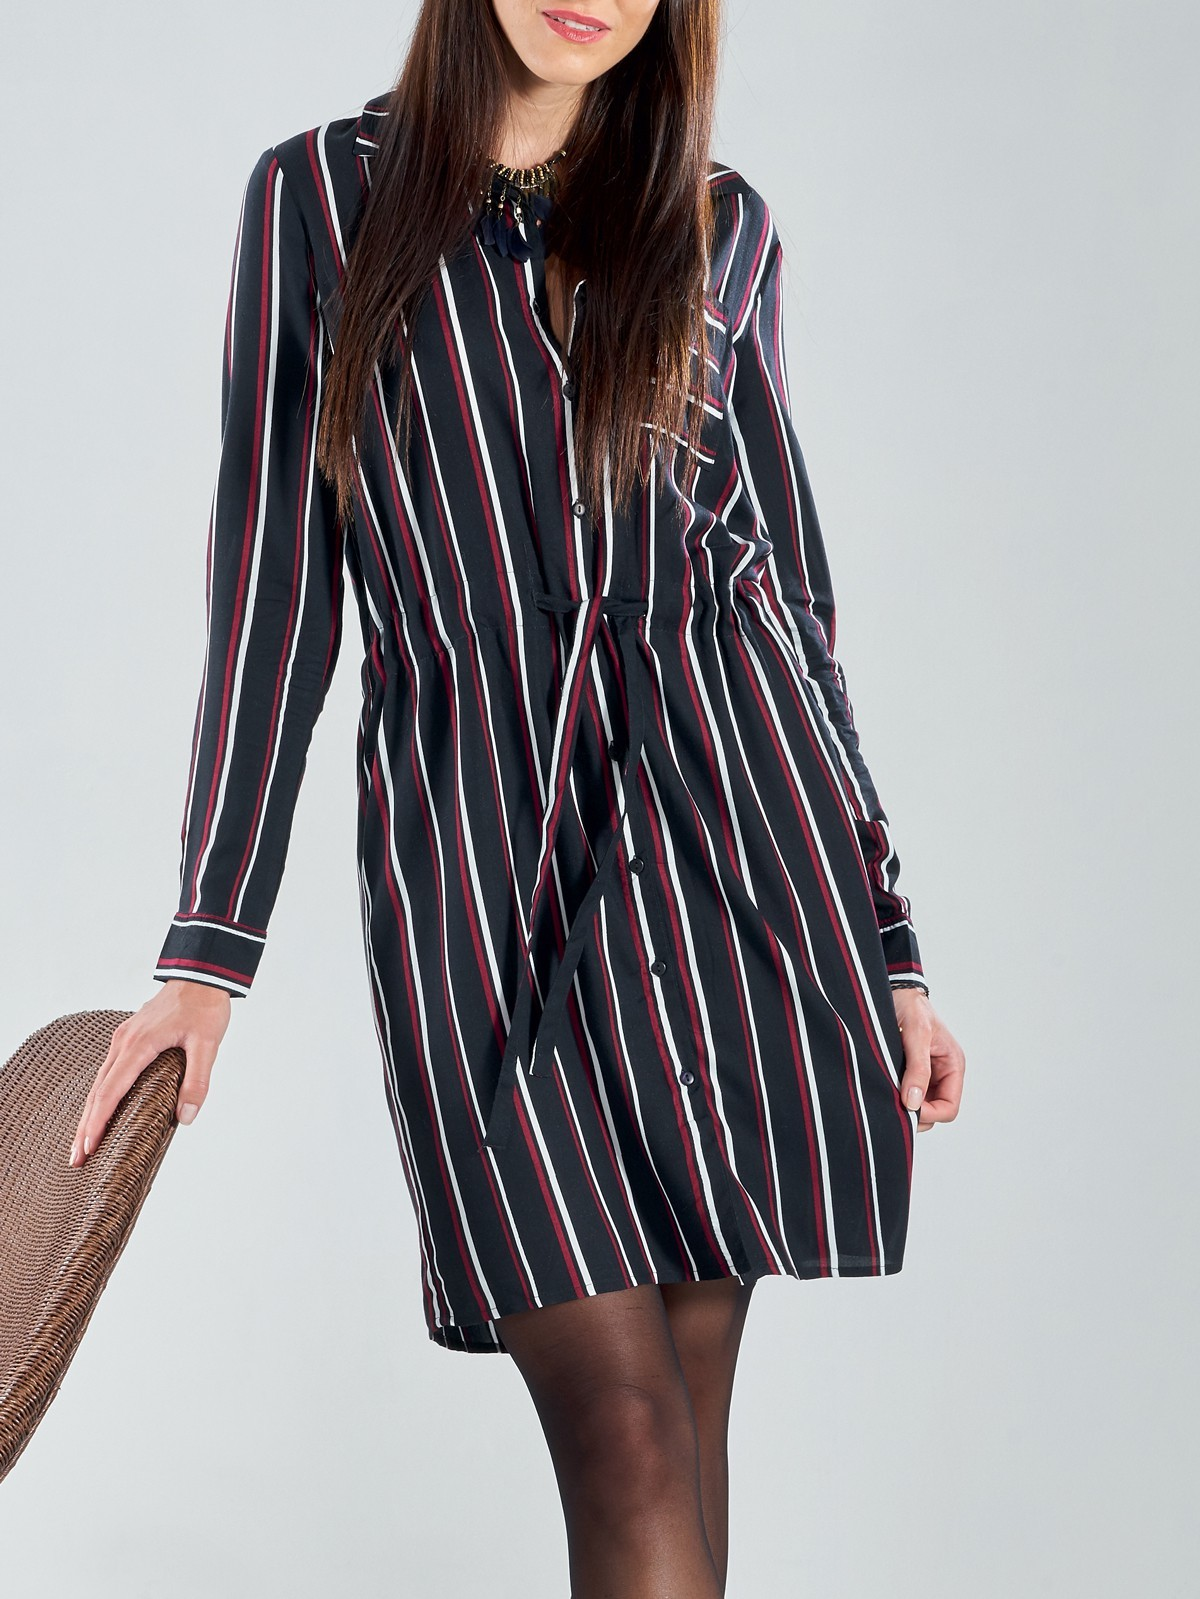 Robe chemise rayée femme - DistriCenter 782aee00e67